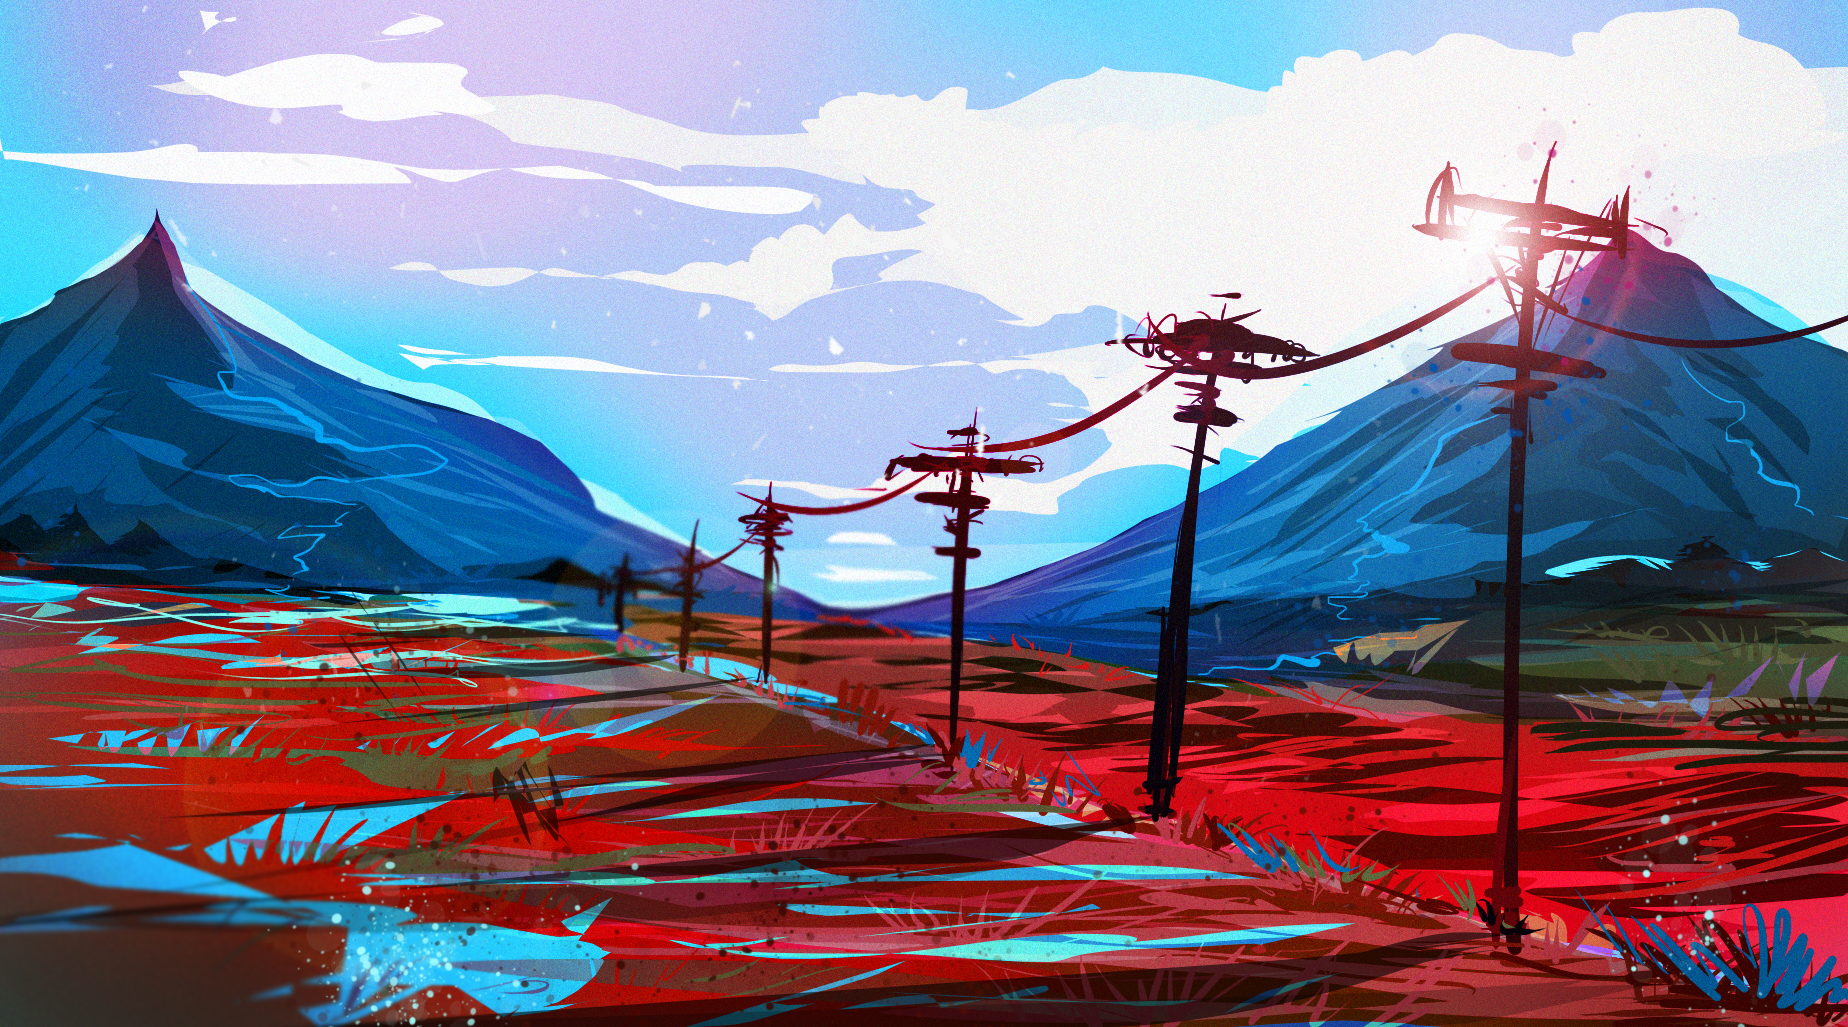 speed_painting_05_by_ryky-d9ik20x.jpg